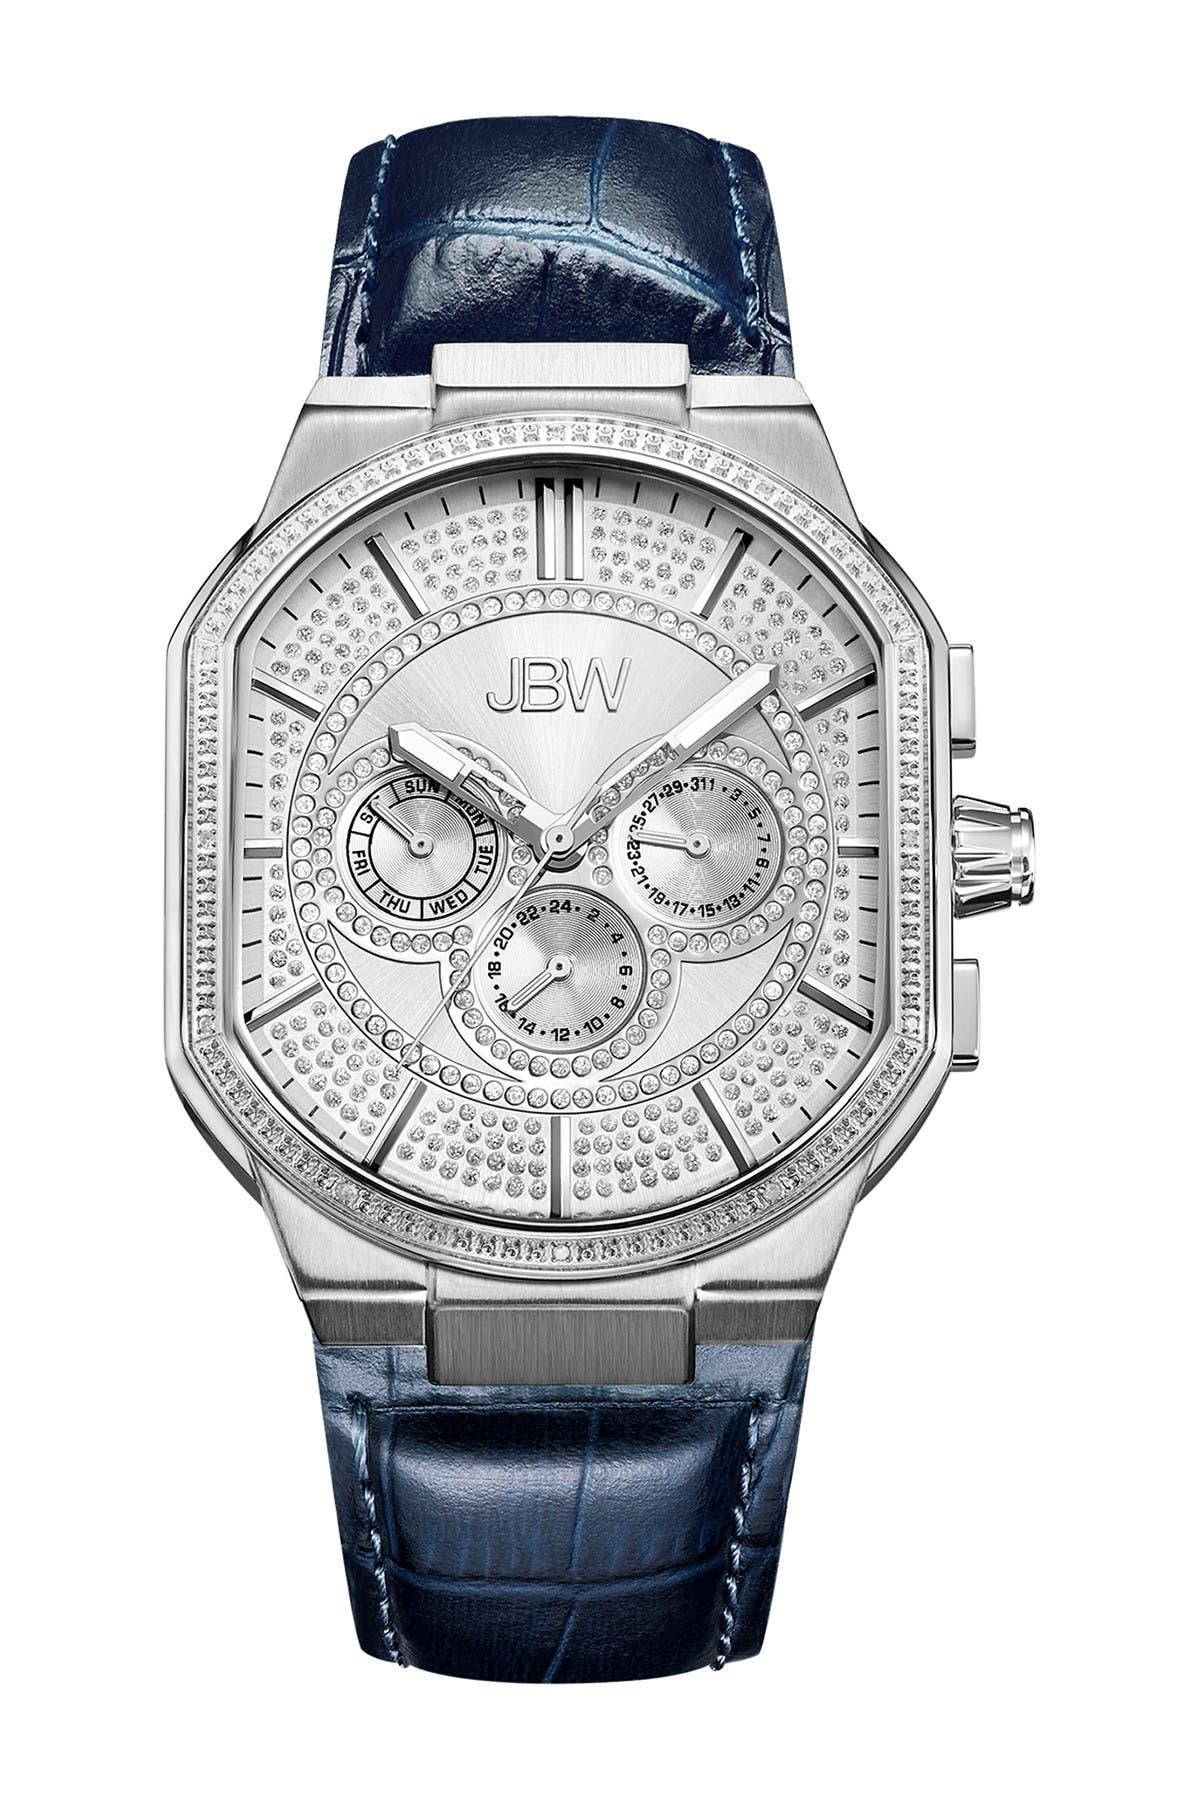 Image of JBW Men's Bond Diamond Embellished Croc Embossed Leather Strap Watch, 43mm - 0.12 ctw